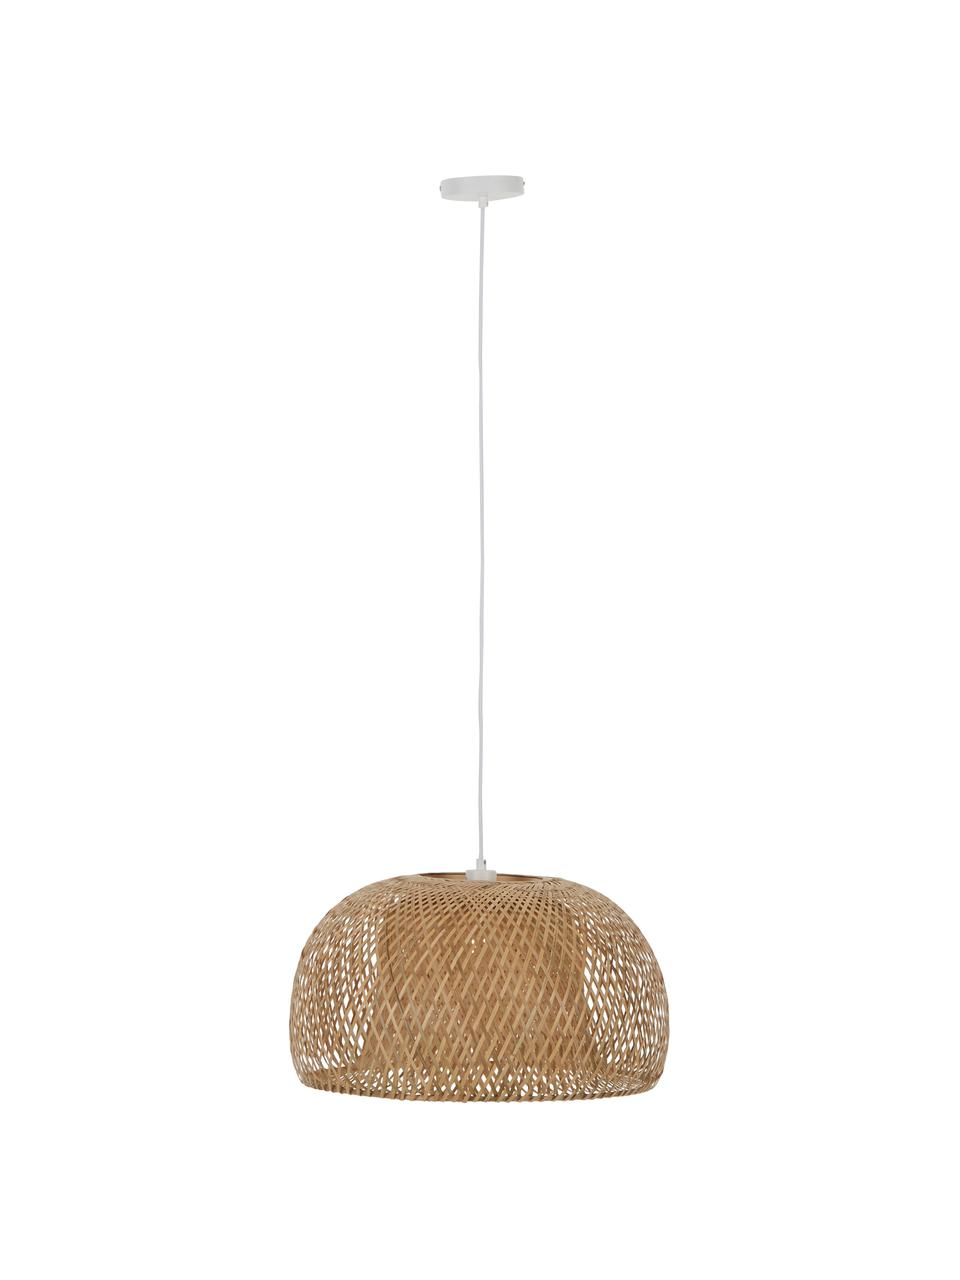 Design Pendelleuchte Eden aus Bambus, Lampenschirm: Bambus, Baldachin: Metall, Bambus, ∅ 55 x H 27 cm